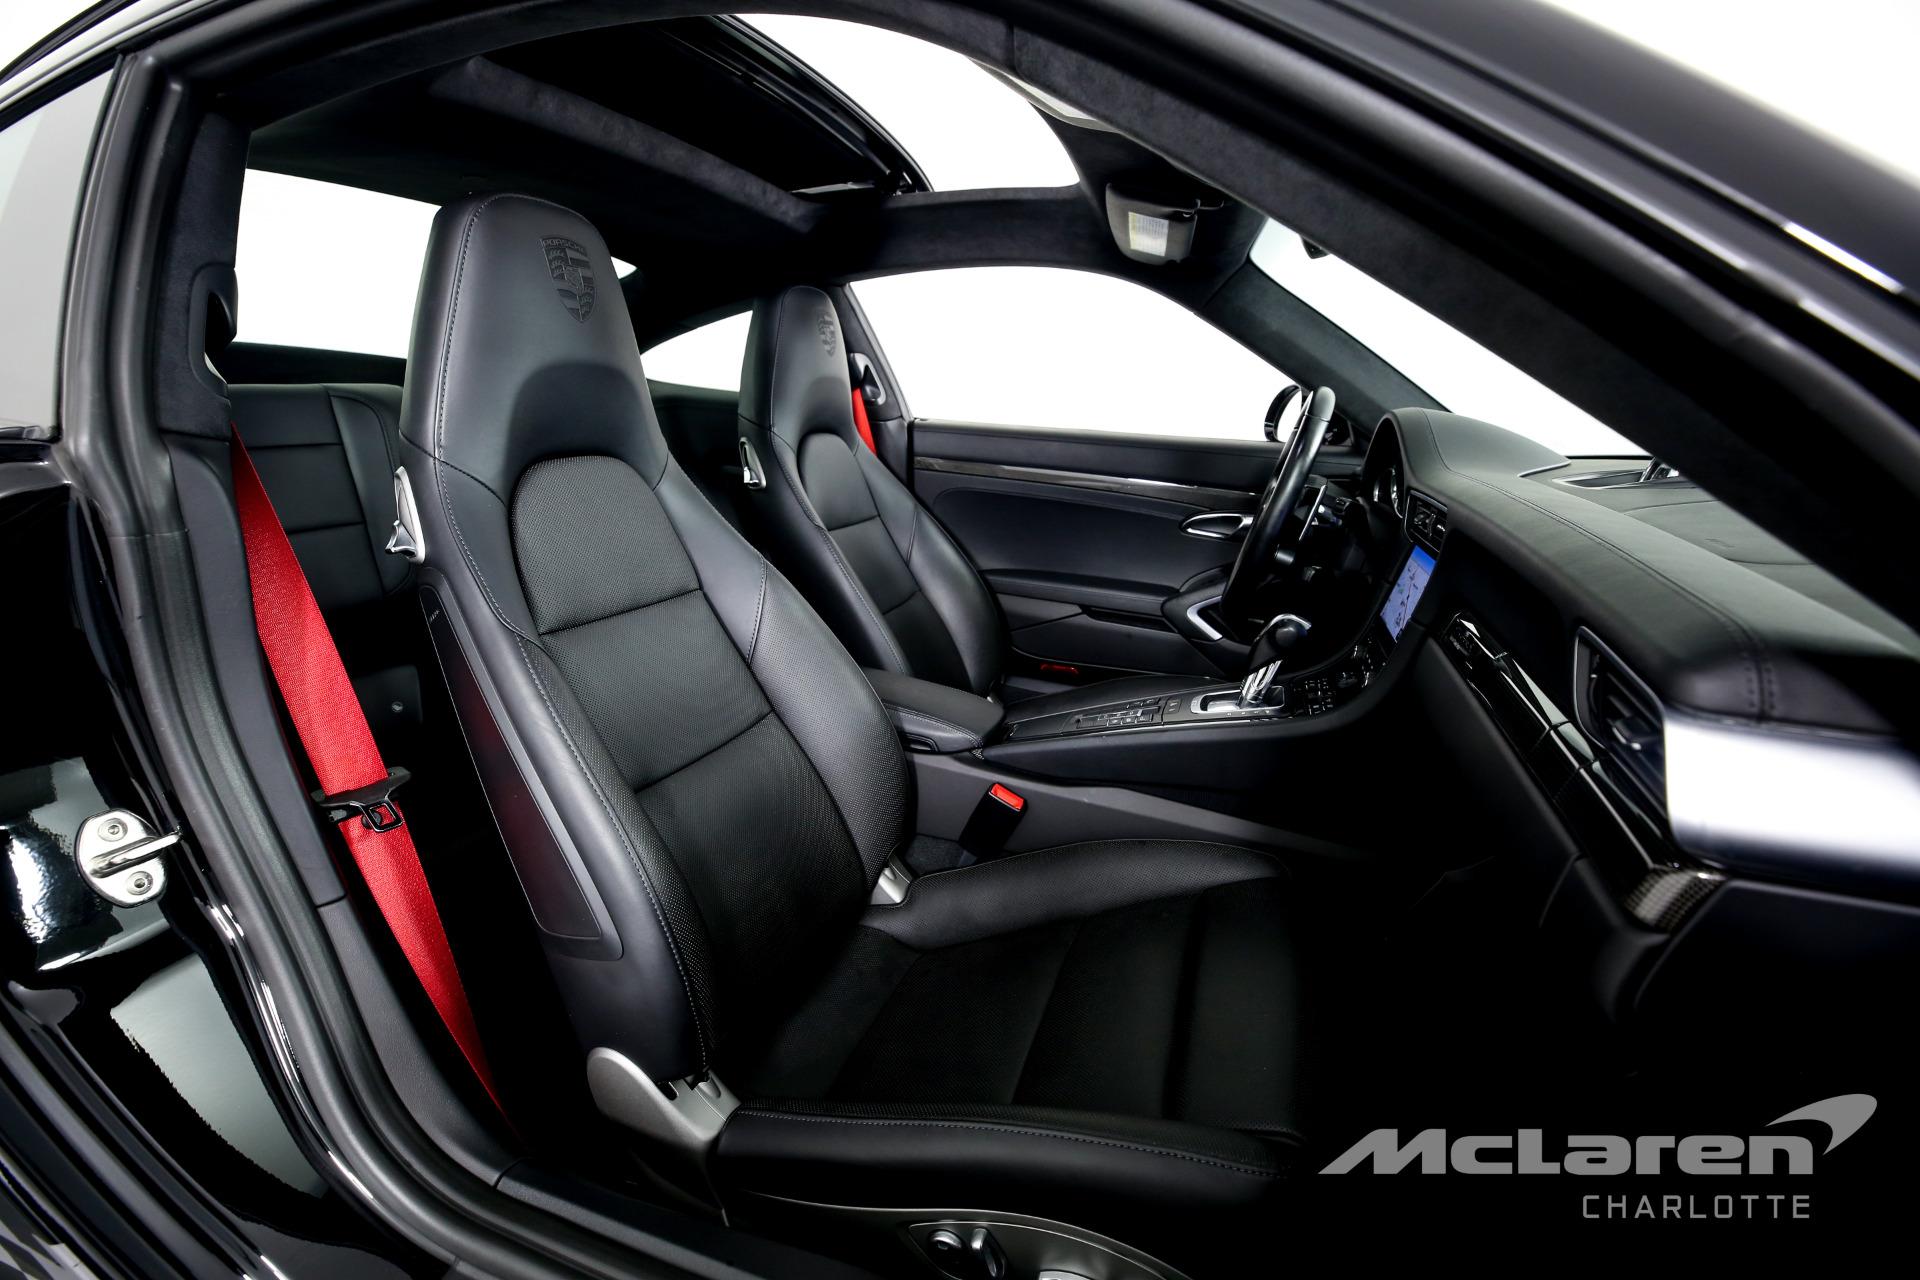 Used 2017 Porsche 911 Carrera S ENDURANCE RACING EDITION   Charlotte, NC